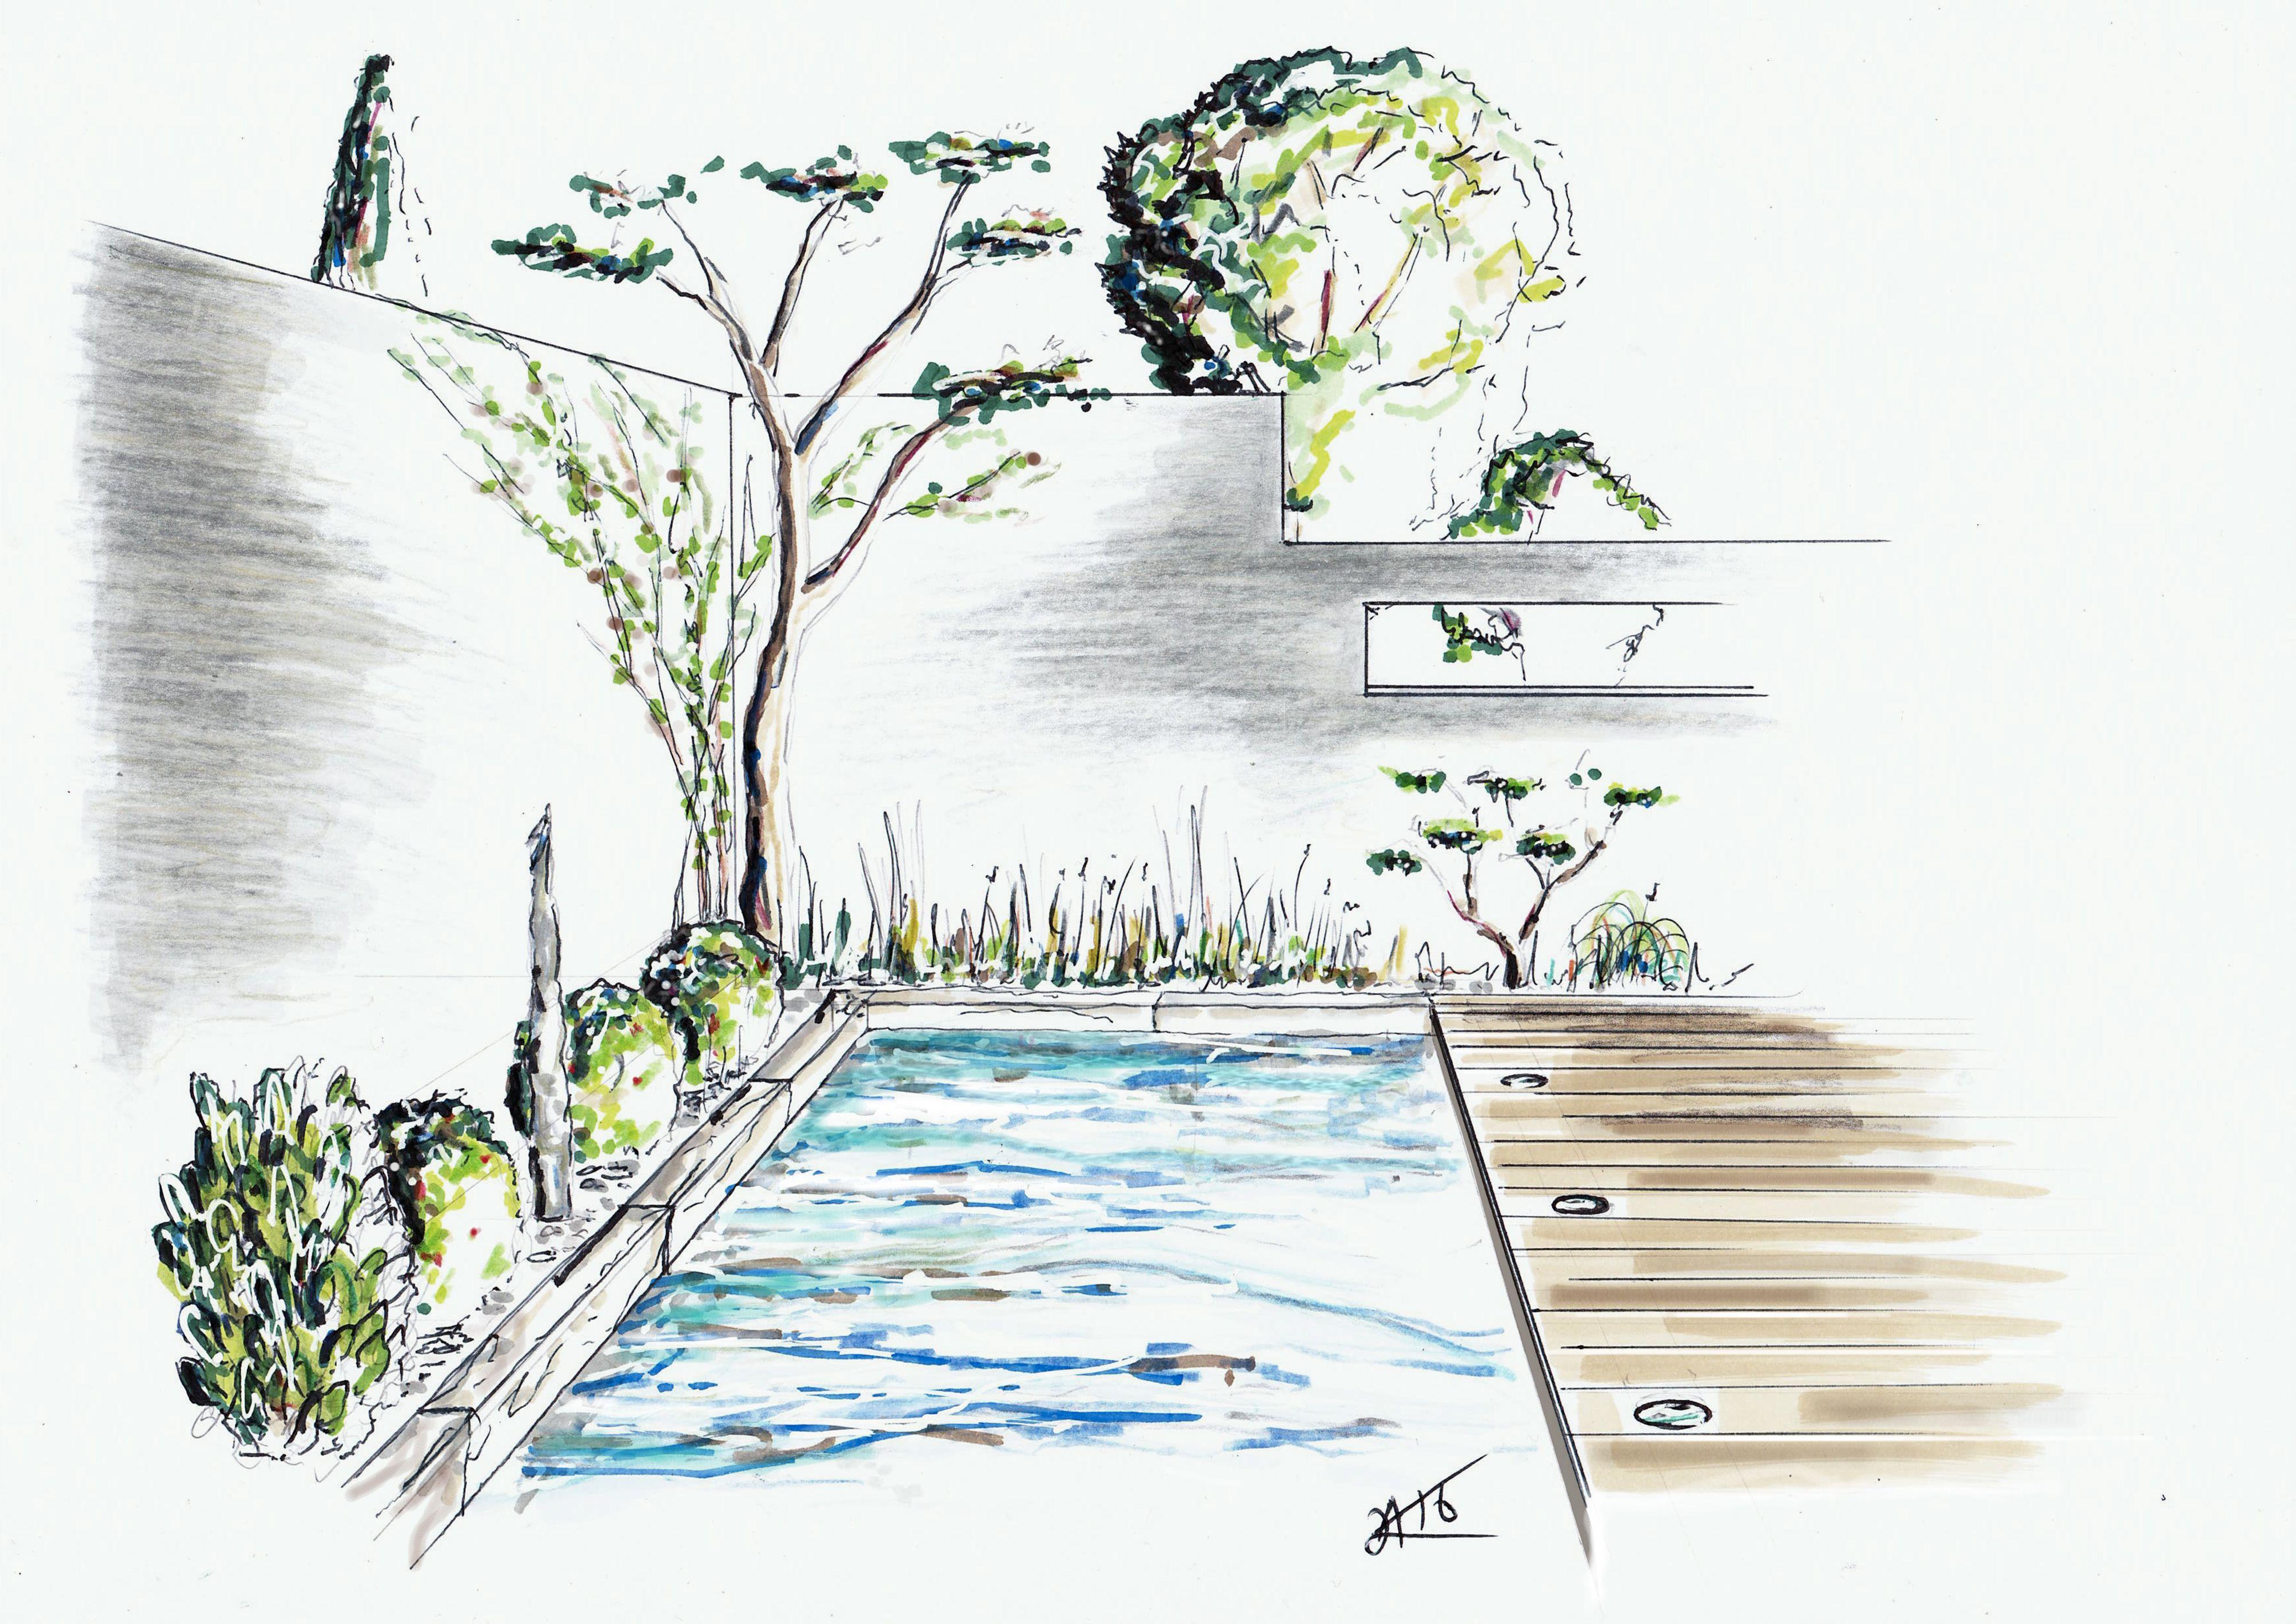 dessin perspective croquis paysage alexandre trubert dessin perspective. Black Bedroom Furniture Sets. Home Design Ideas